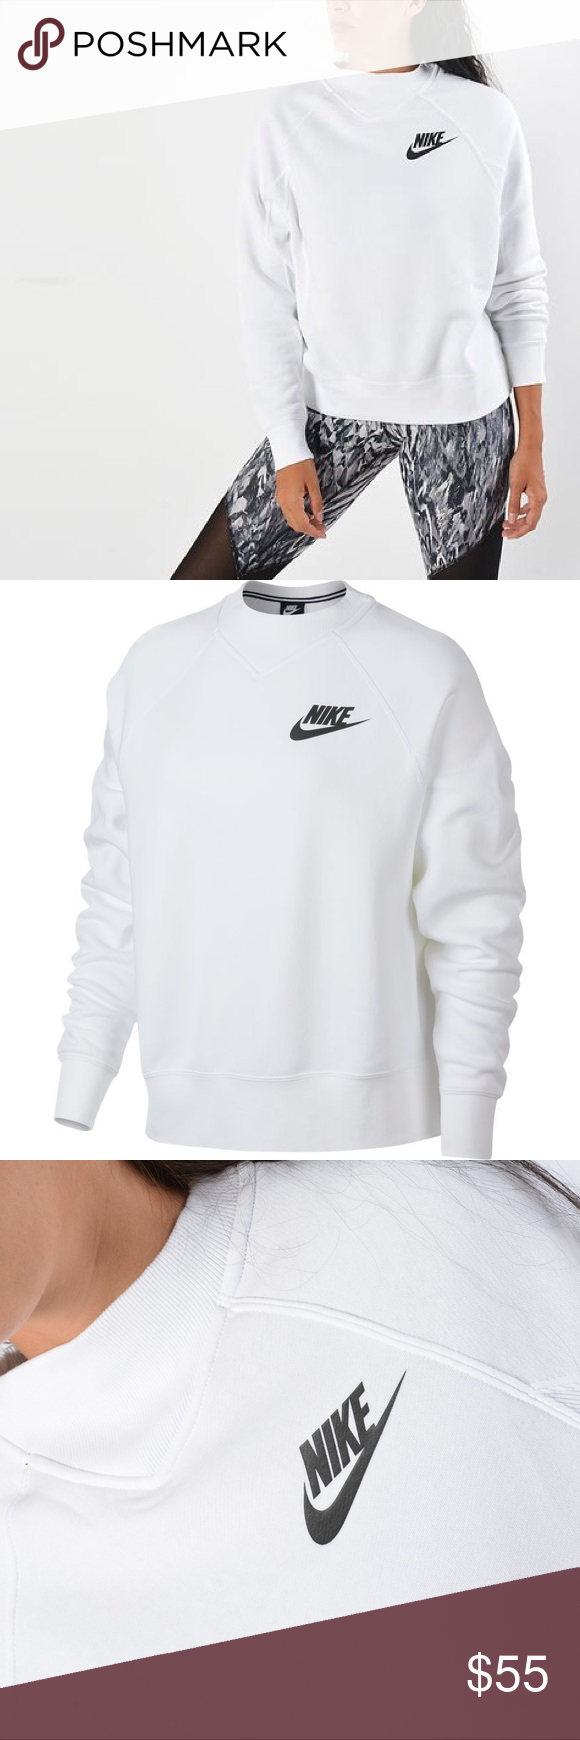 Predownload: Nike Sportswear Rally Crew Sweatshirt Nike Sportswear Clothes Design Crew Sweatshirts [ 1740 x 580 Pixel ]